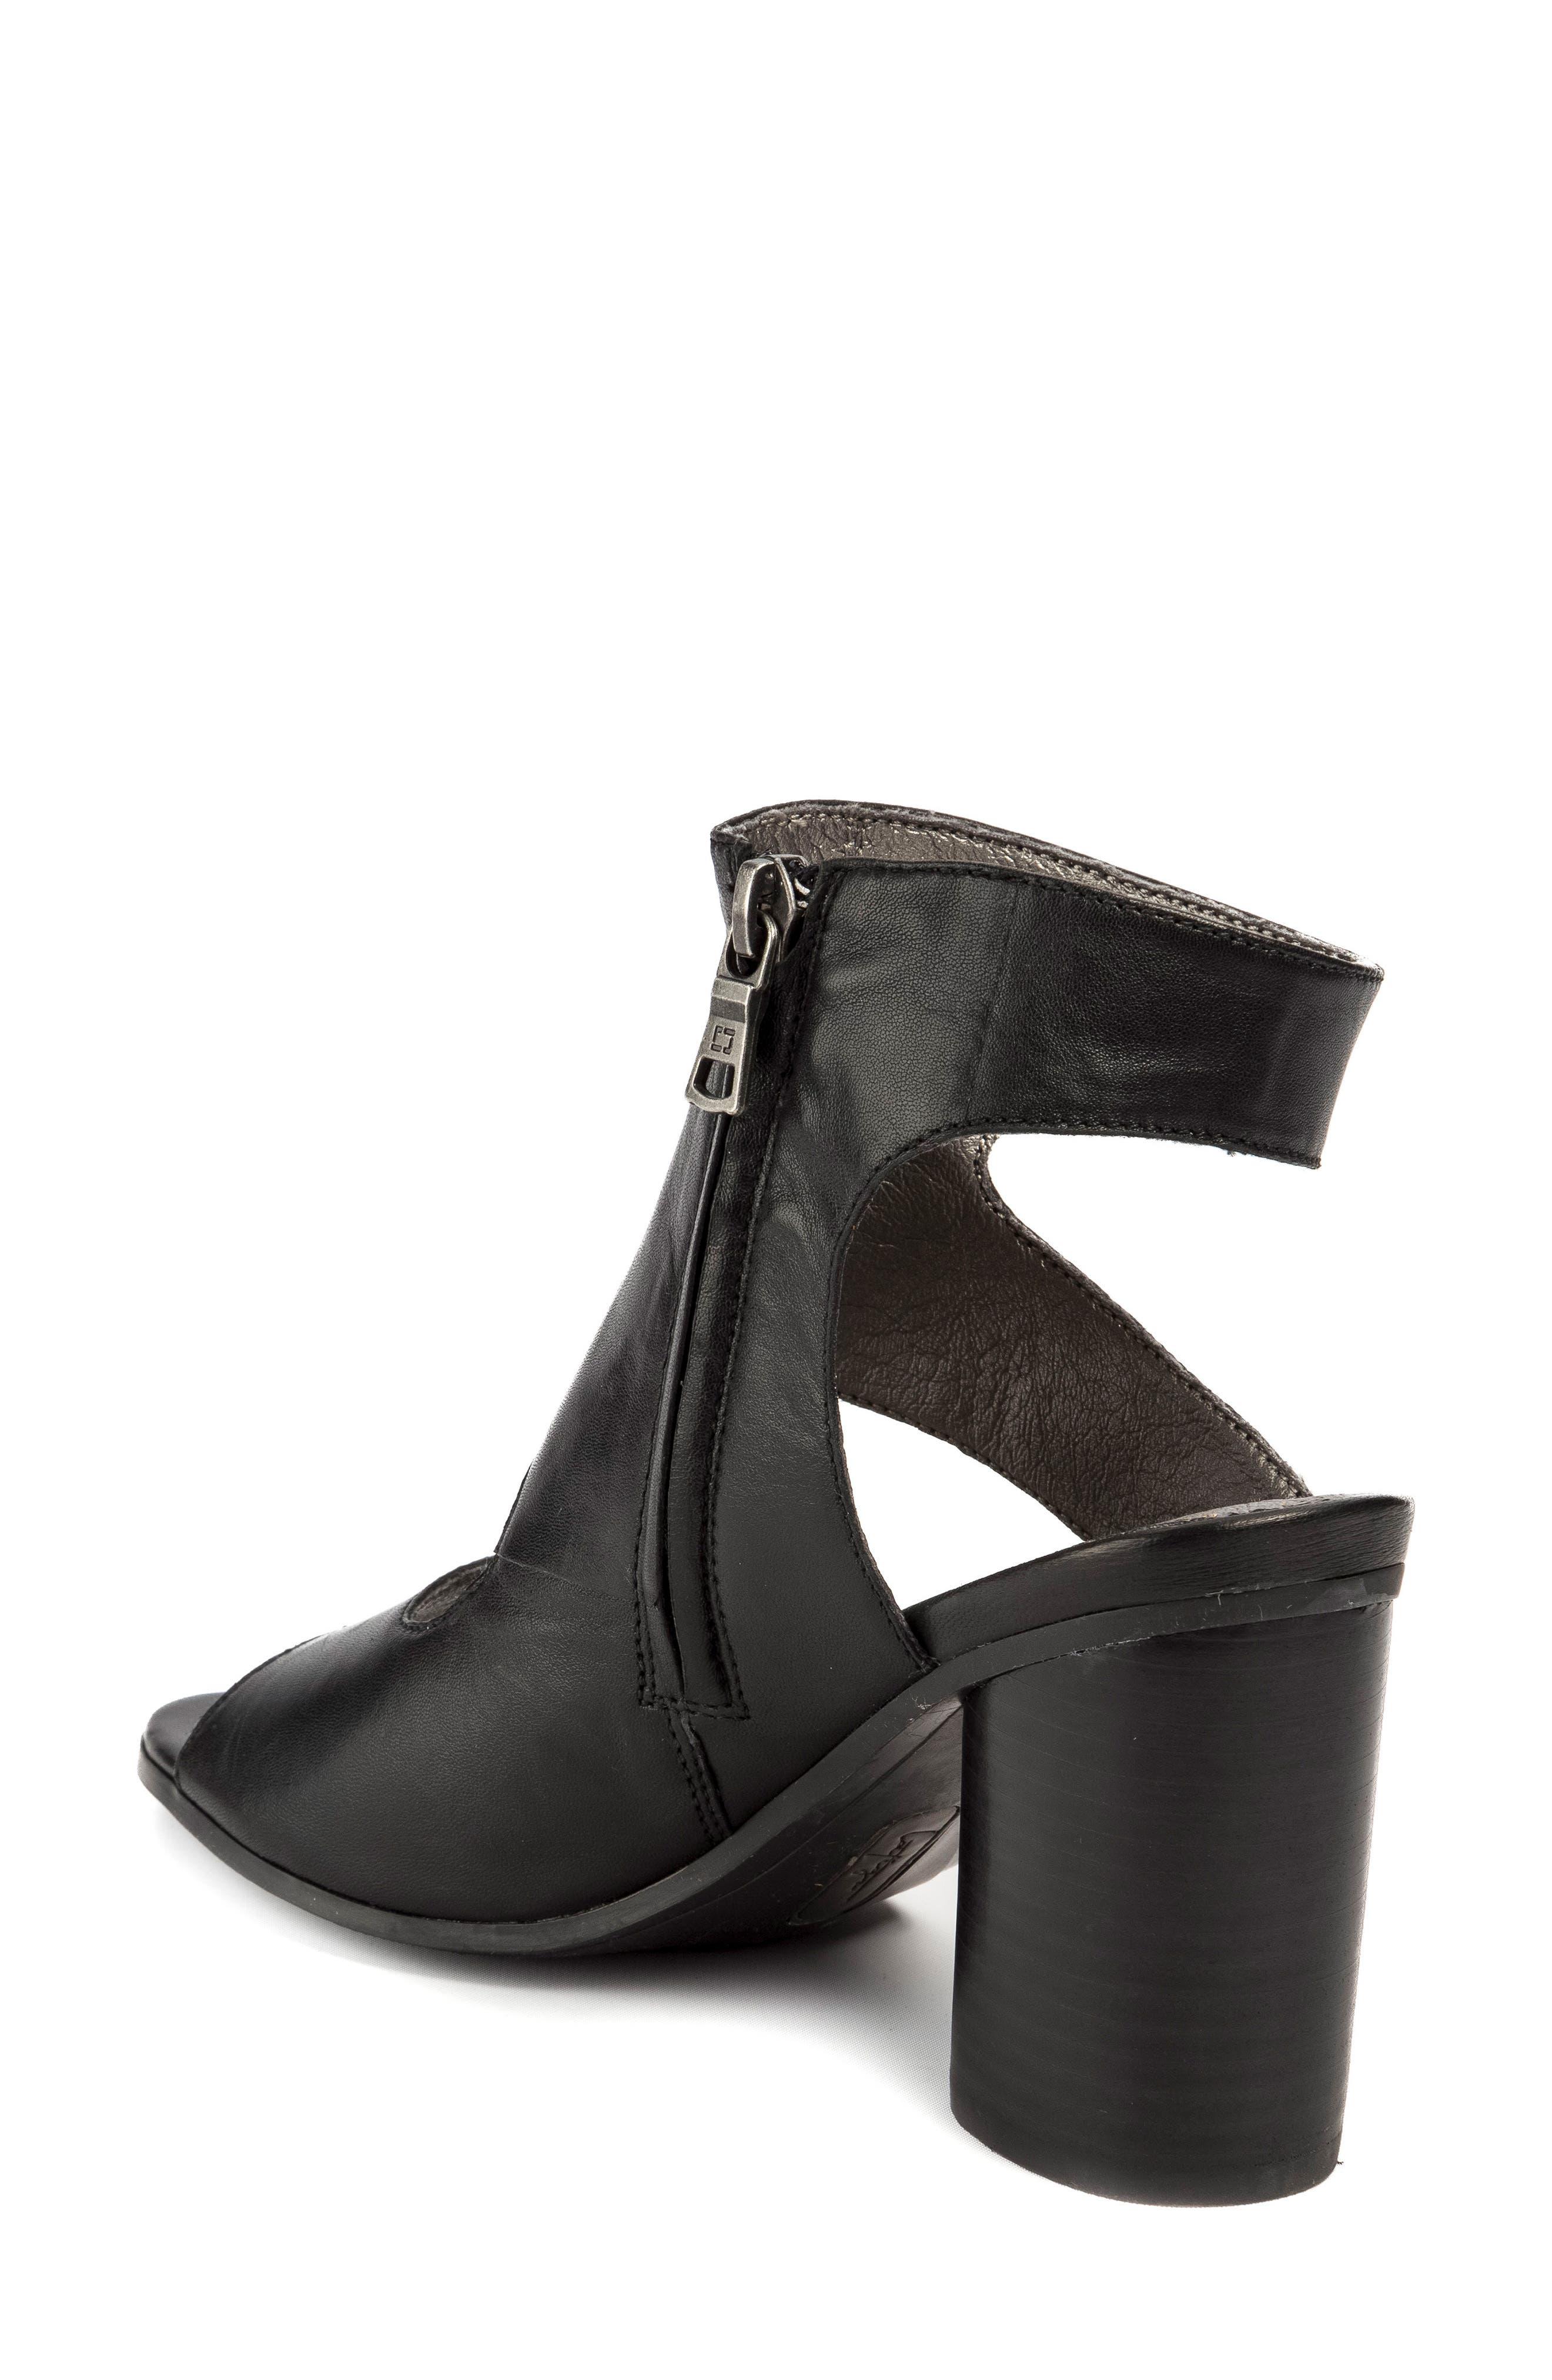 Hadie Asymmetrical Tall Sandal,                             Alternate thumbnail 2, color,                             Black Leather